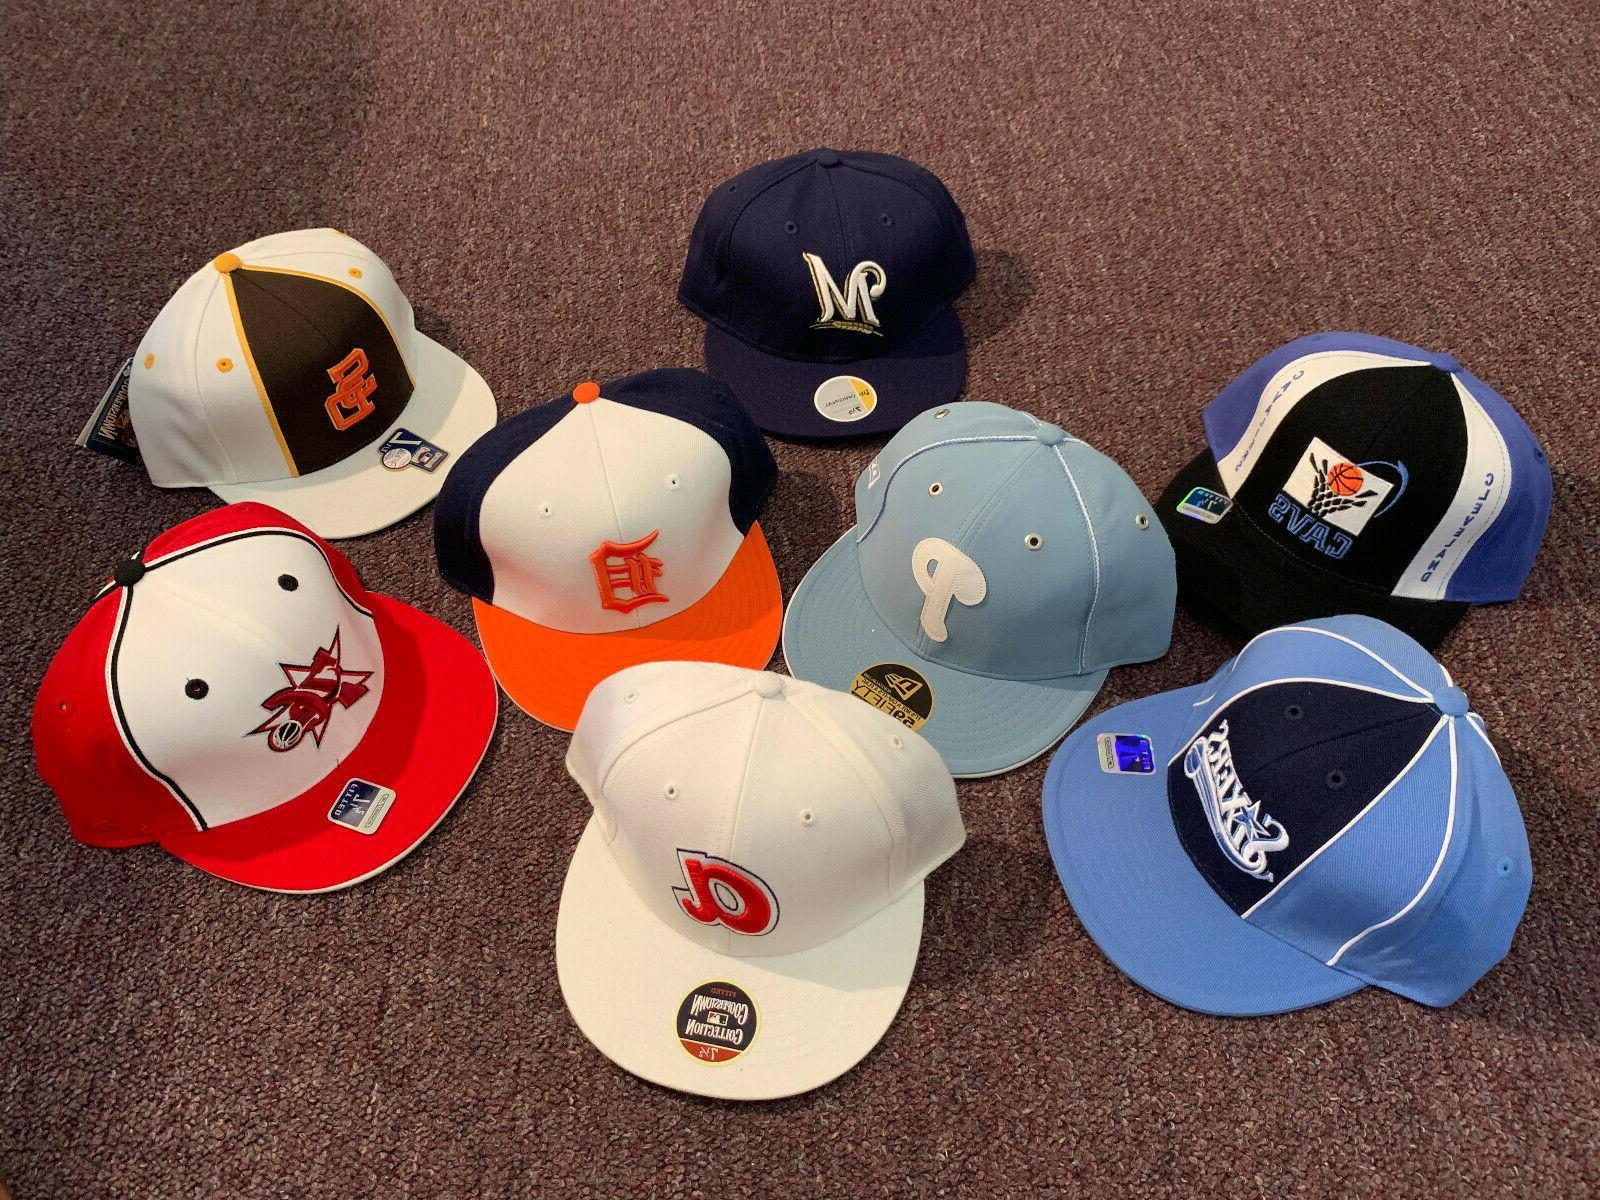 NBA NFL MLB Baseball Caps, 7-1/2, Reebok Original